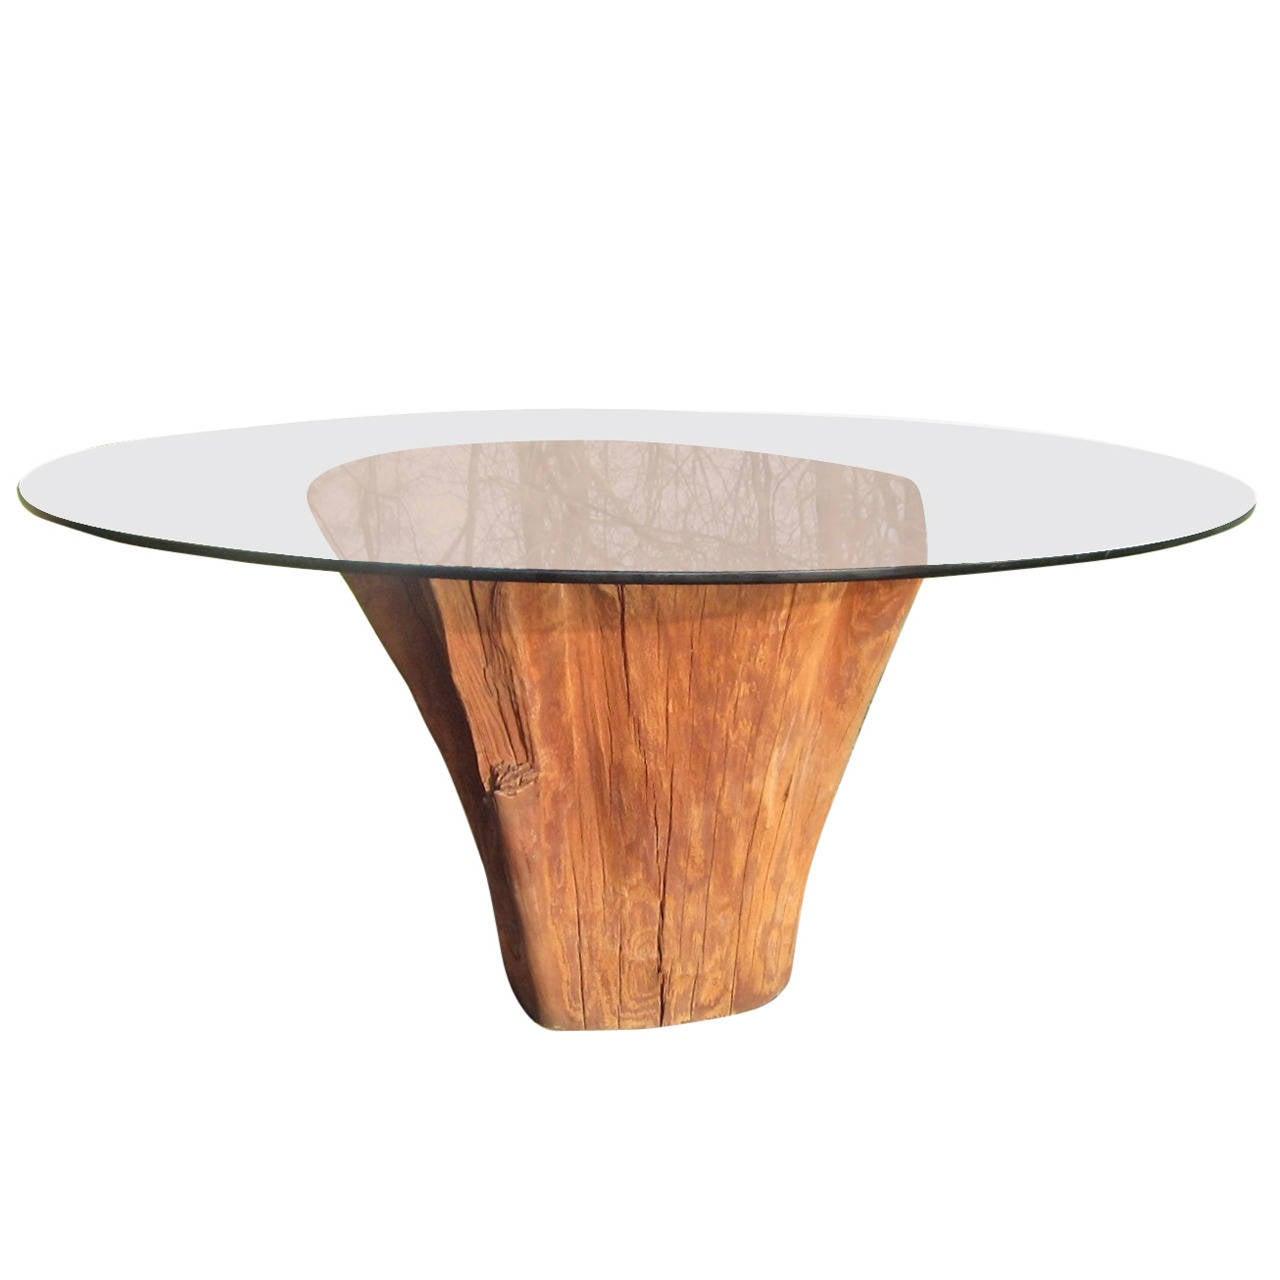 cypress dining table at 1stdibs. Black Bedroom Furniture Sets. Home Design Ideas